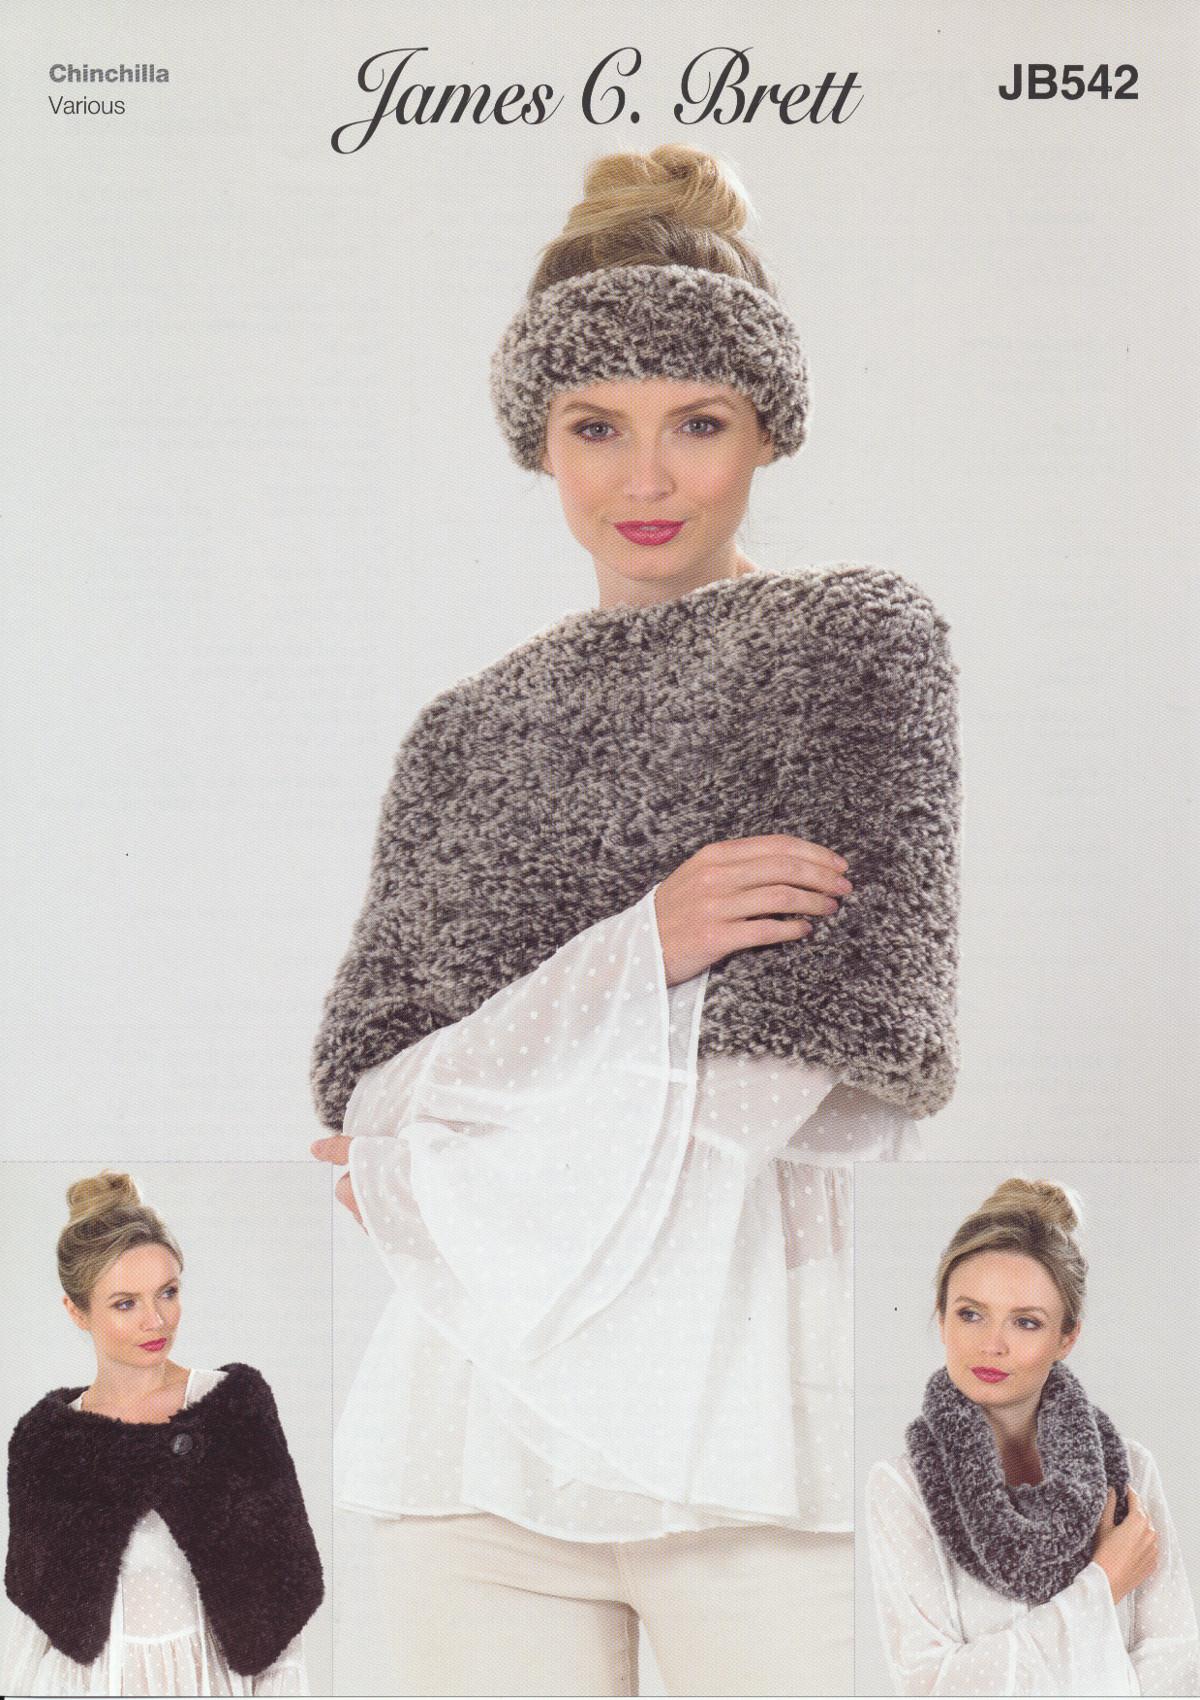 4bf6938e5243a Knitting Pattern Ladies Winter Accessories James Brett Chinchilla ...